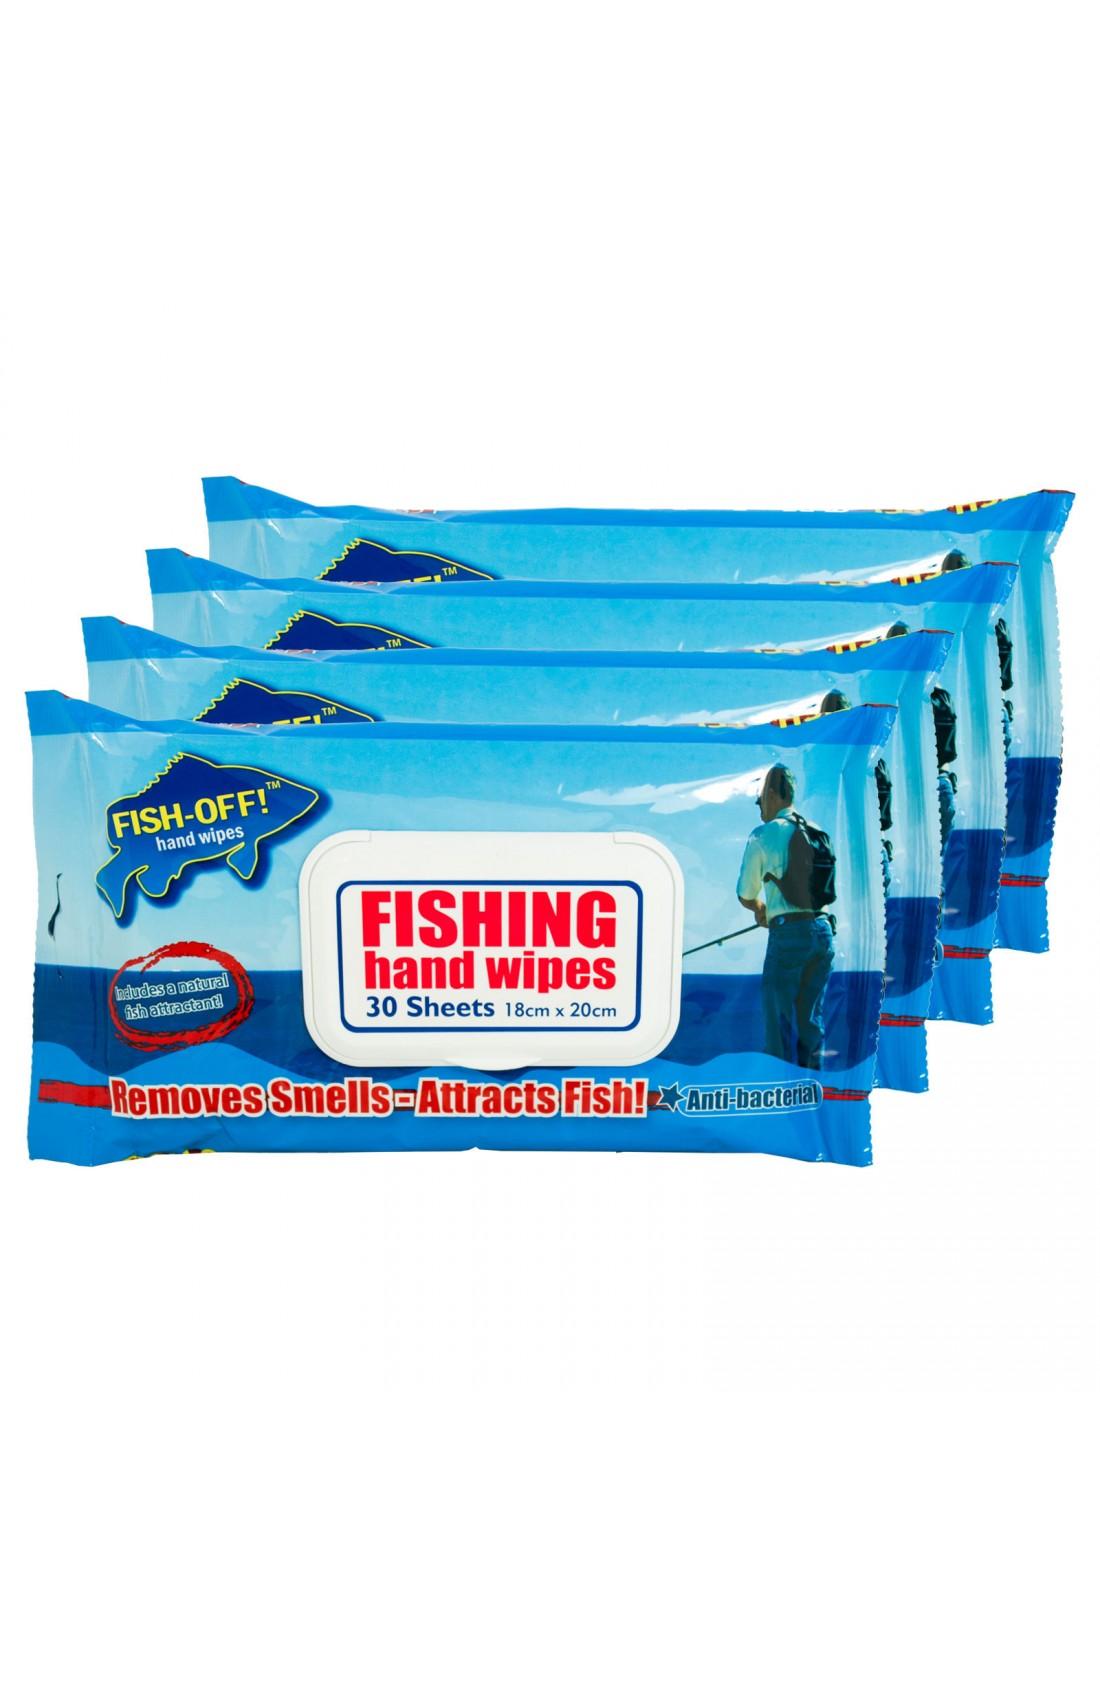 Best Fishing Hand Wipes